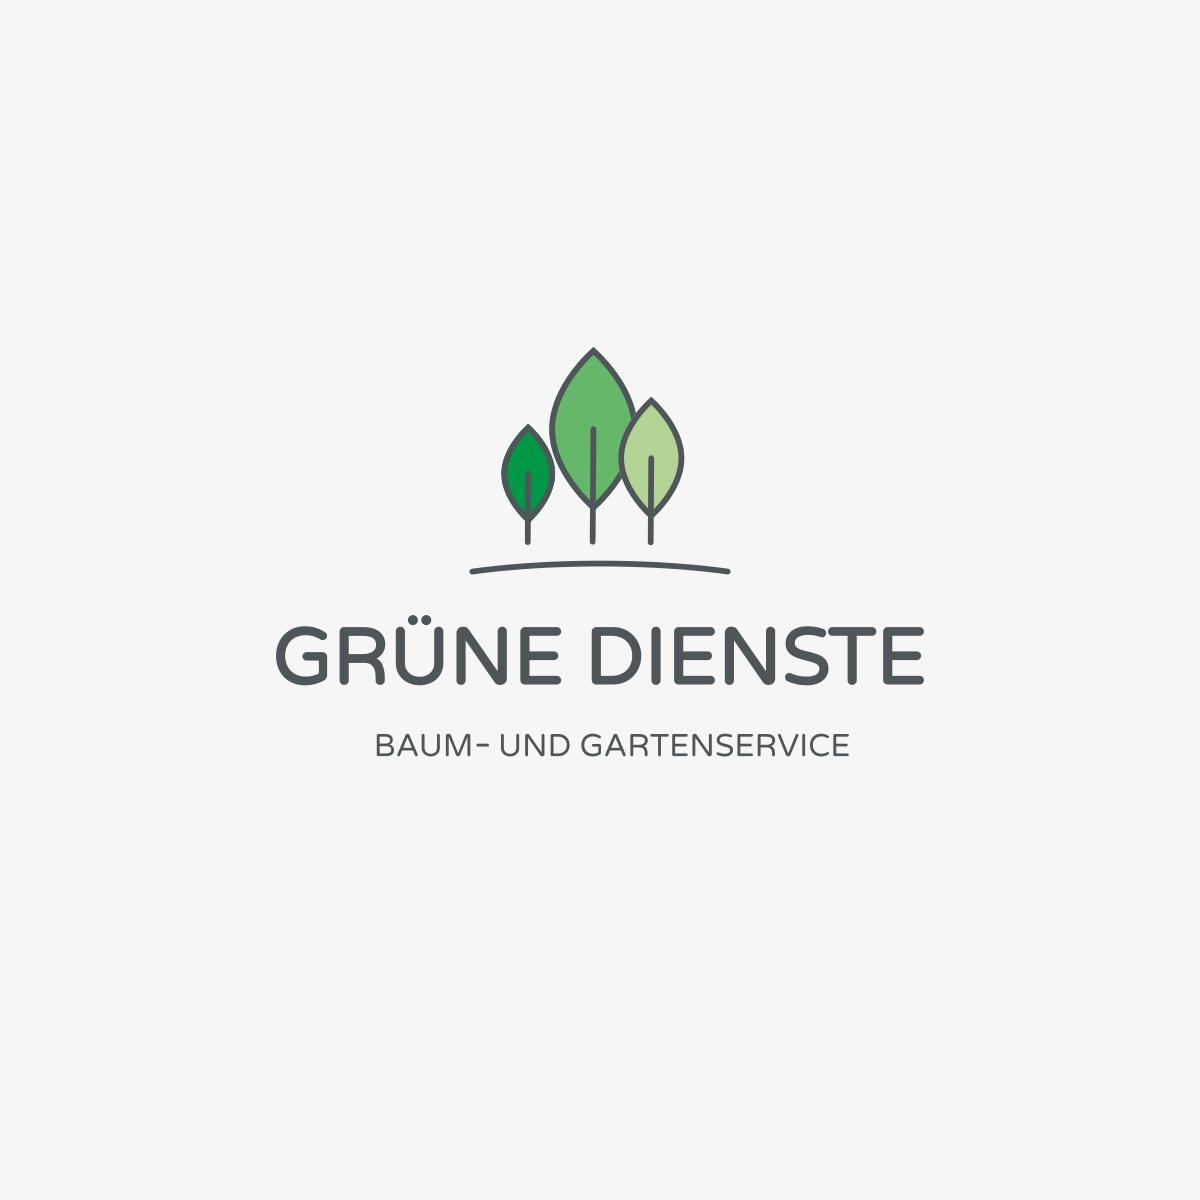 logo-design-gala-bau-baumpflege-baumkletterer-gruene-diente